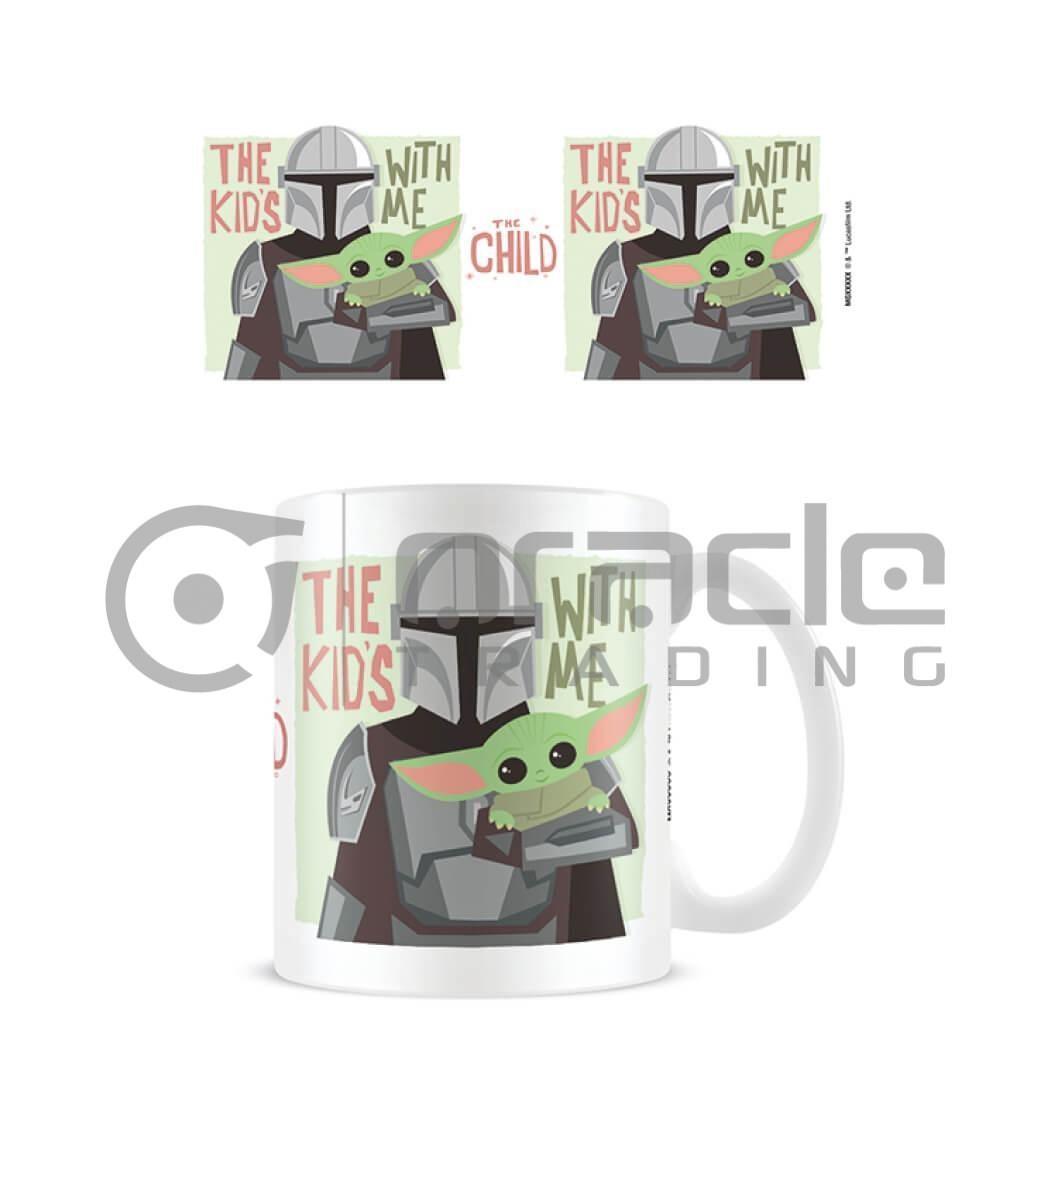 Star Wars: The Mandalorian Mug - The Kids With Me